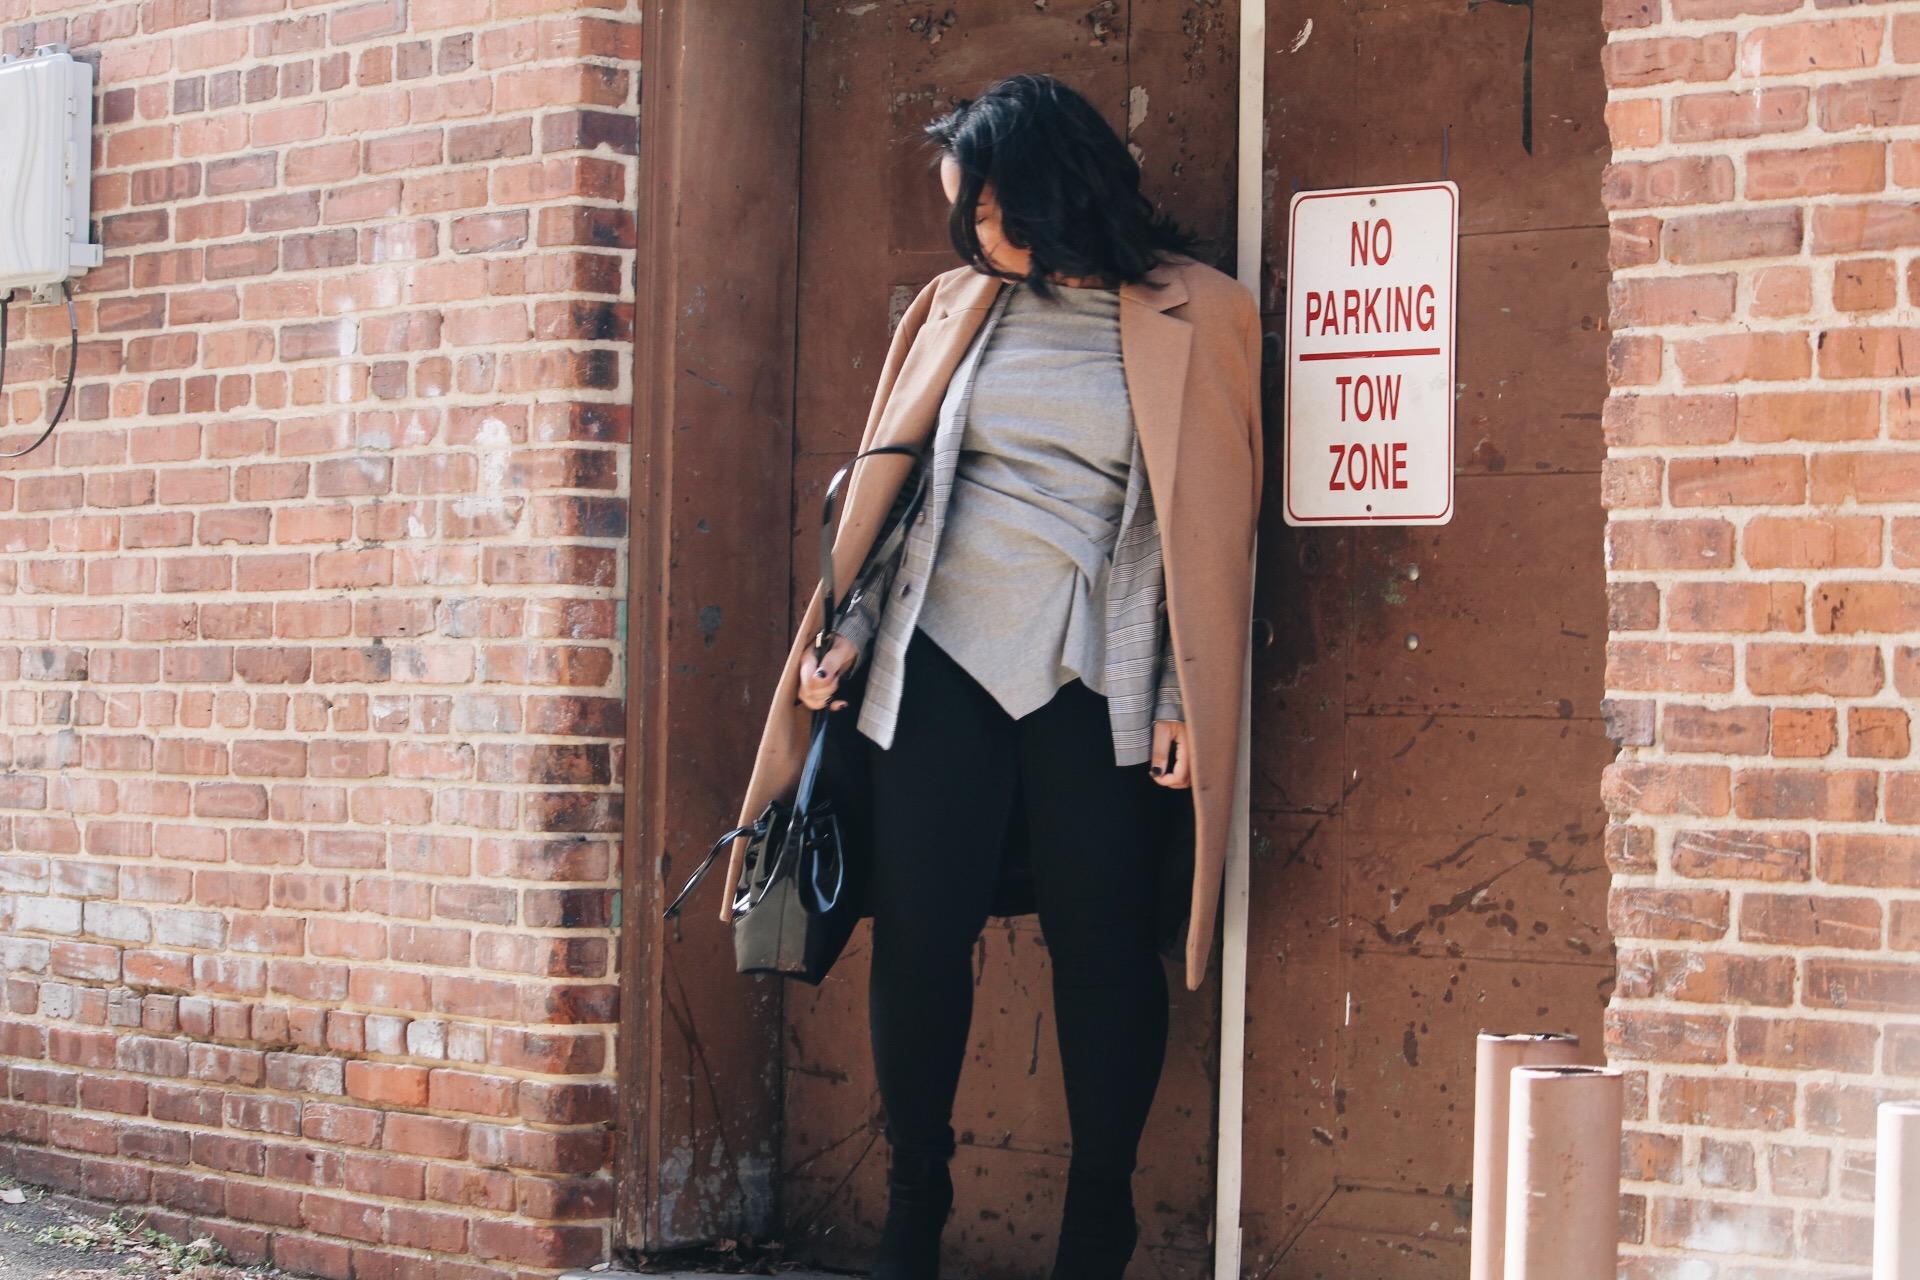 YAS-asos-boyfriend-check-blazer-urban-outfitters-camel-coat-old-navy-rockstar-denim-forever-21-vinyl-bucket-bag-zara-booties-4.JPG